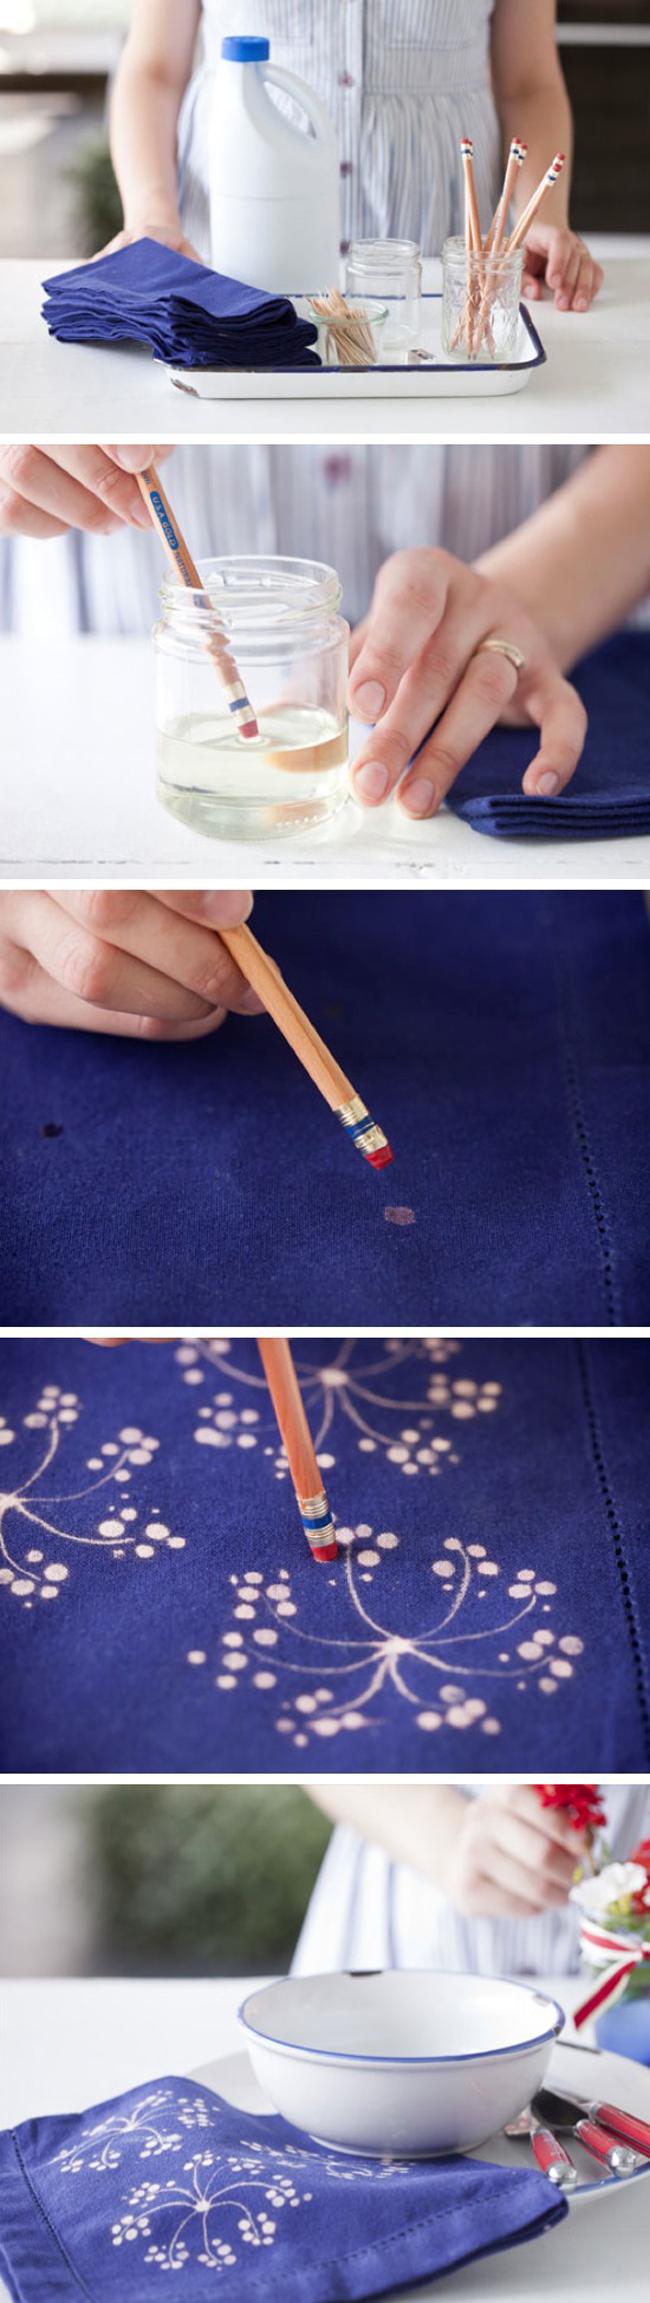 Fabric-Bleach-Art